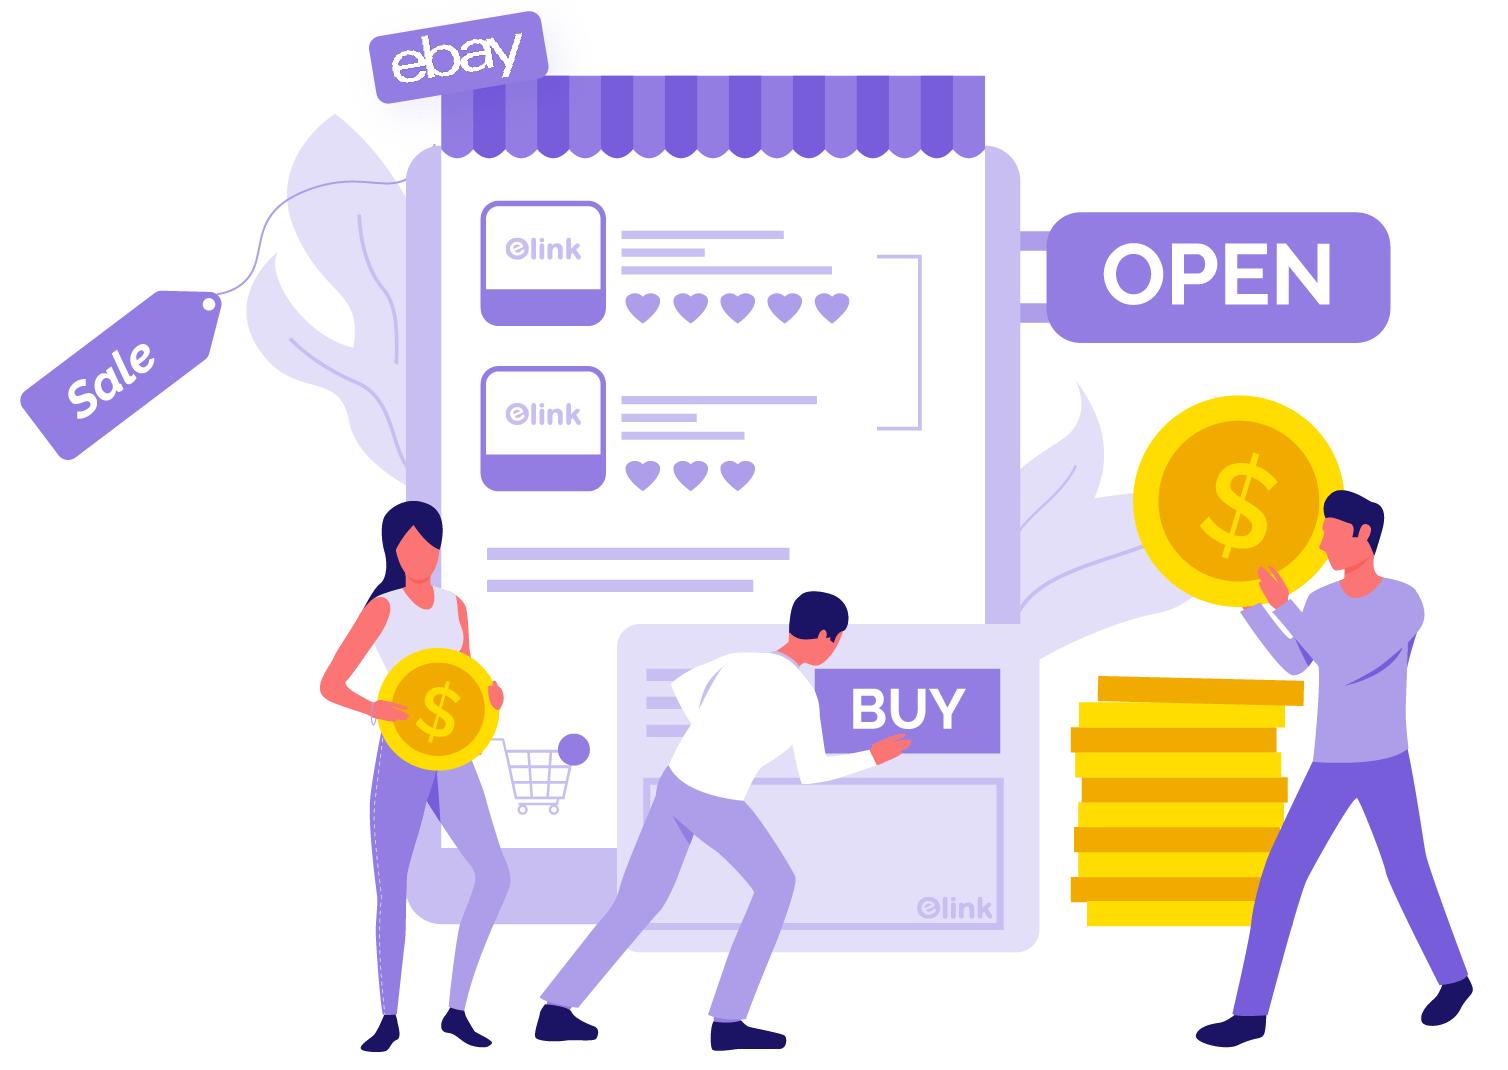 Ebay Seller as a small business idea